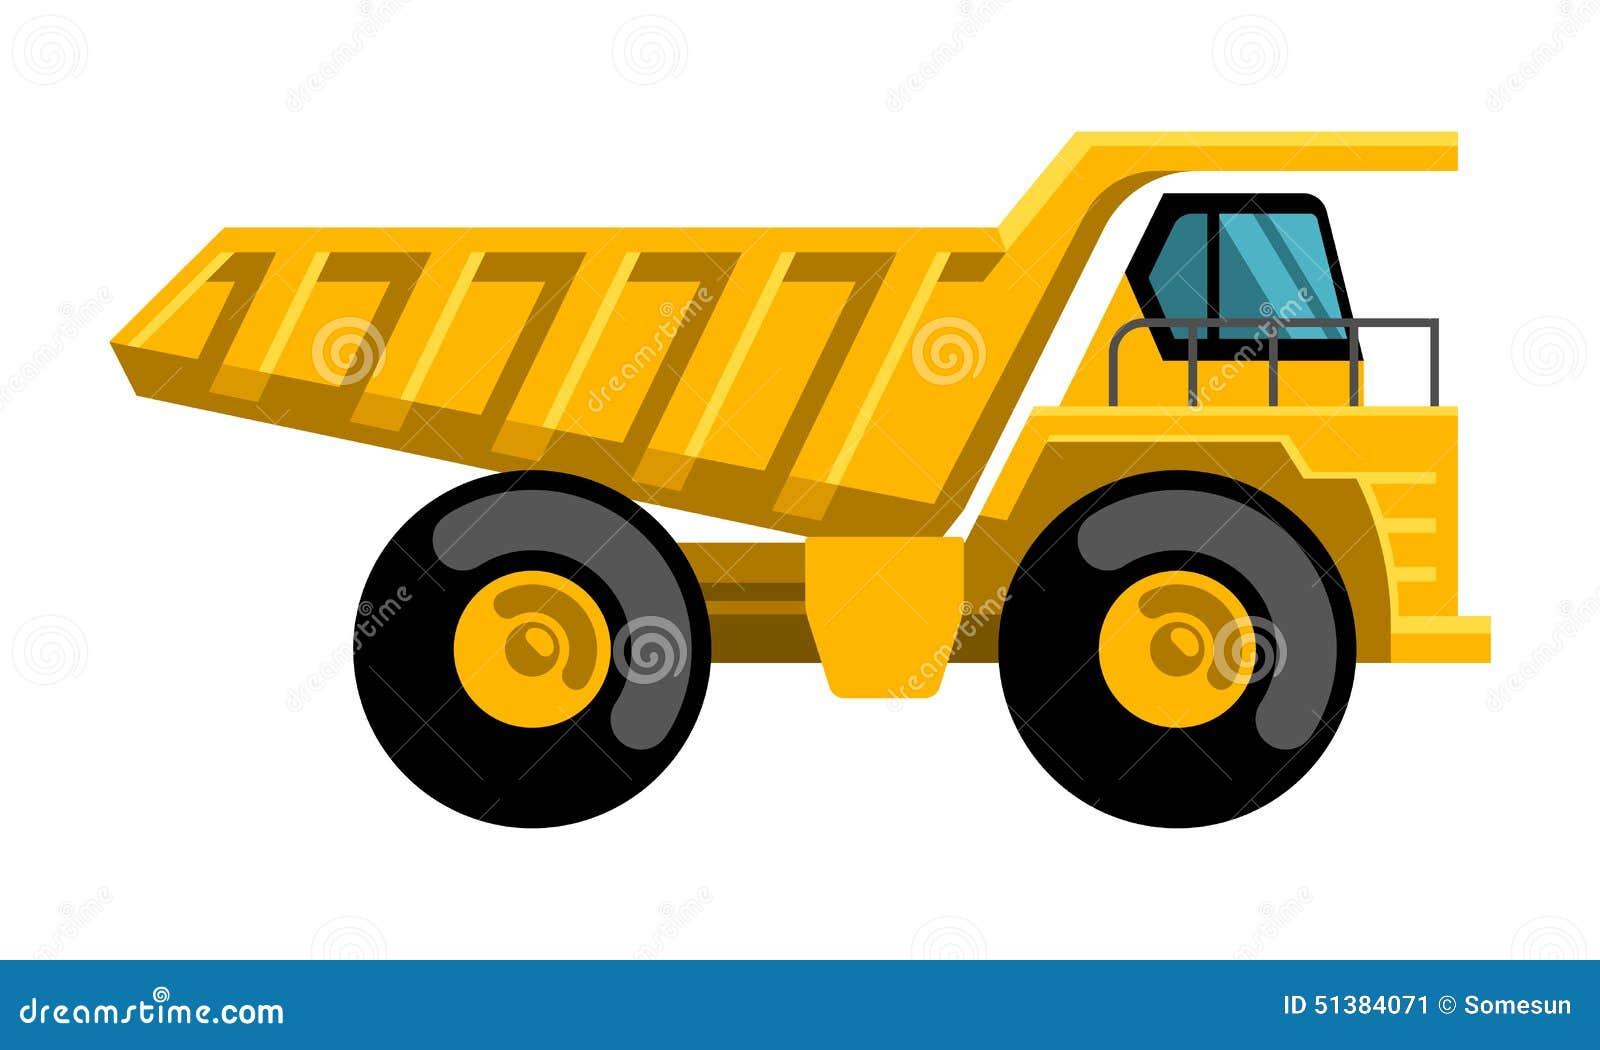 mining dump truck flat design vector icon stock vector dump truck clipart design svg dump truck clipart silhouette